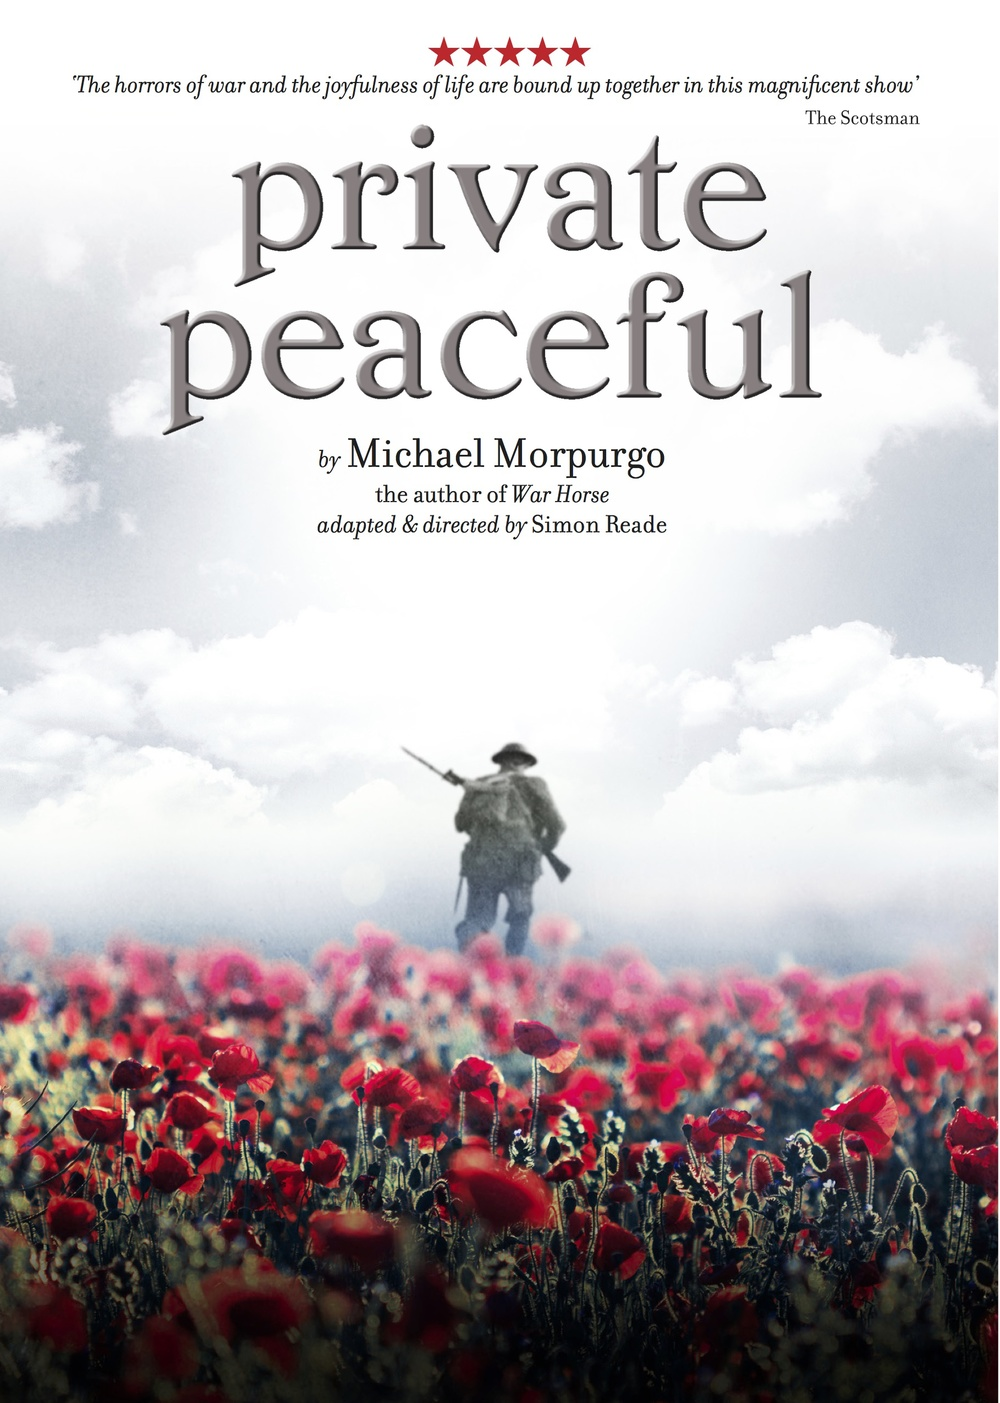 PrivatePeaceful_Generic-Venue copy.jpg